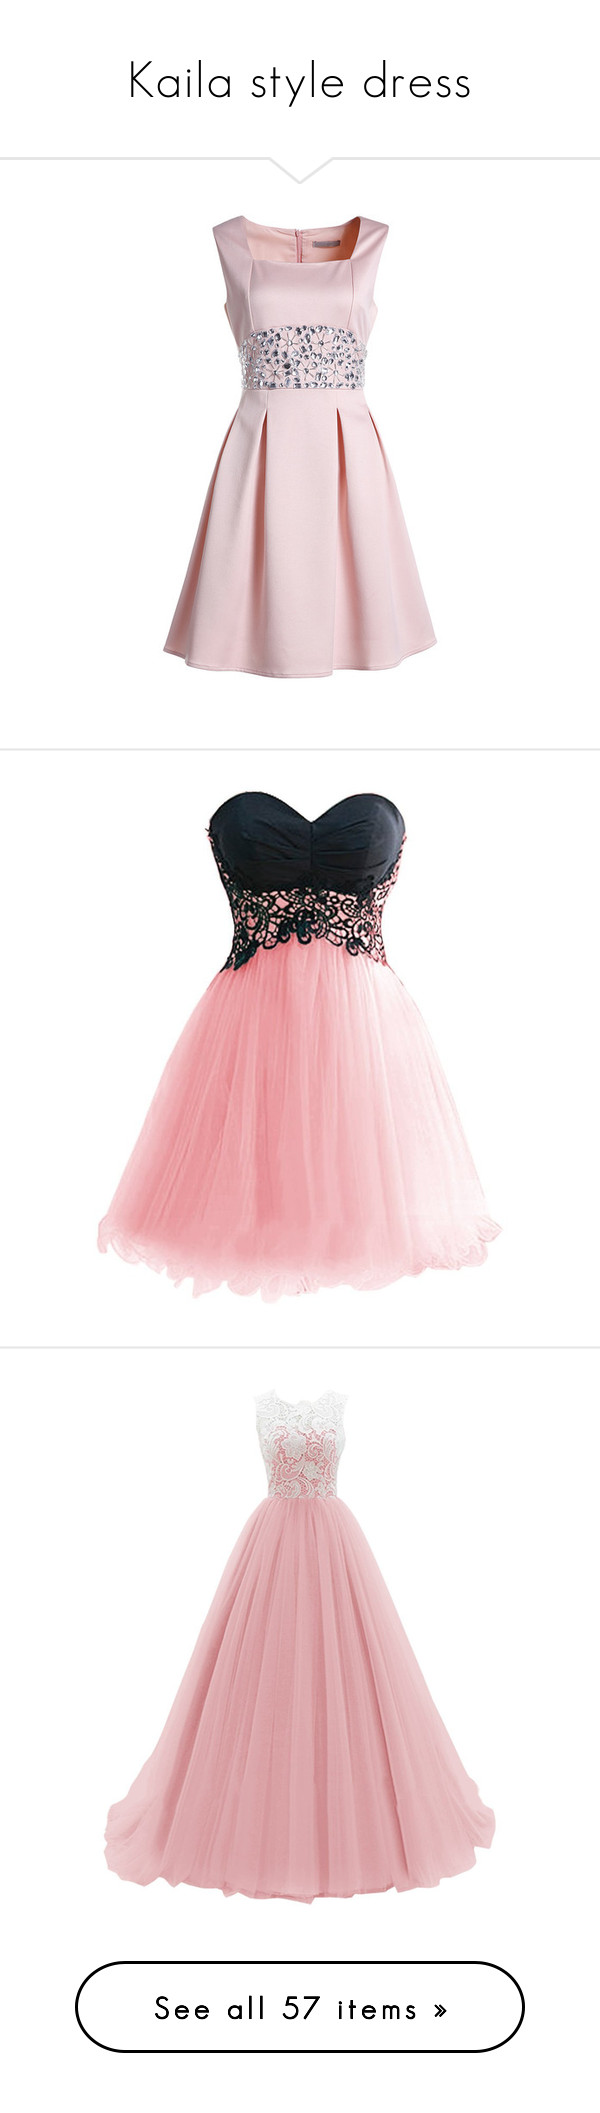 Kaila style dress\